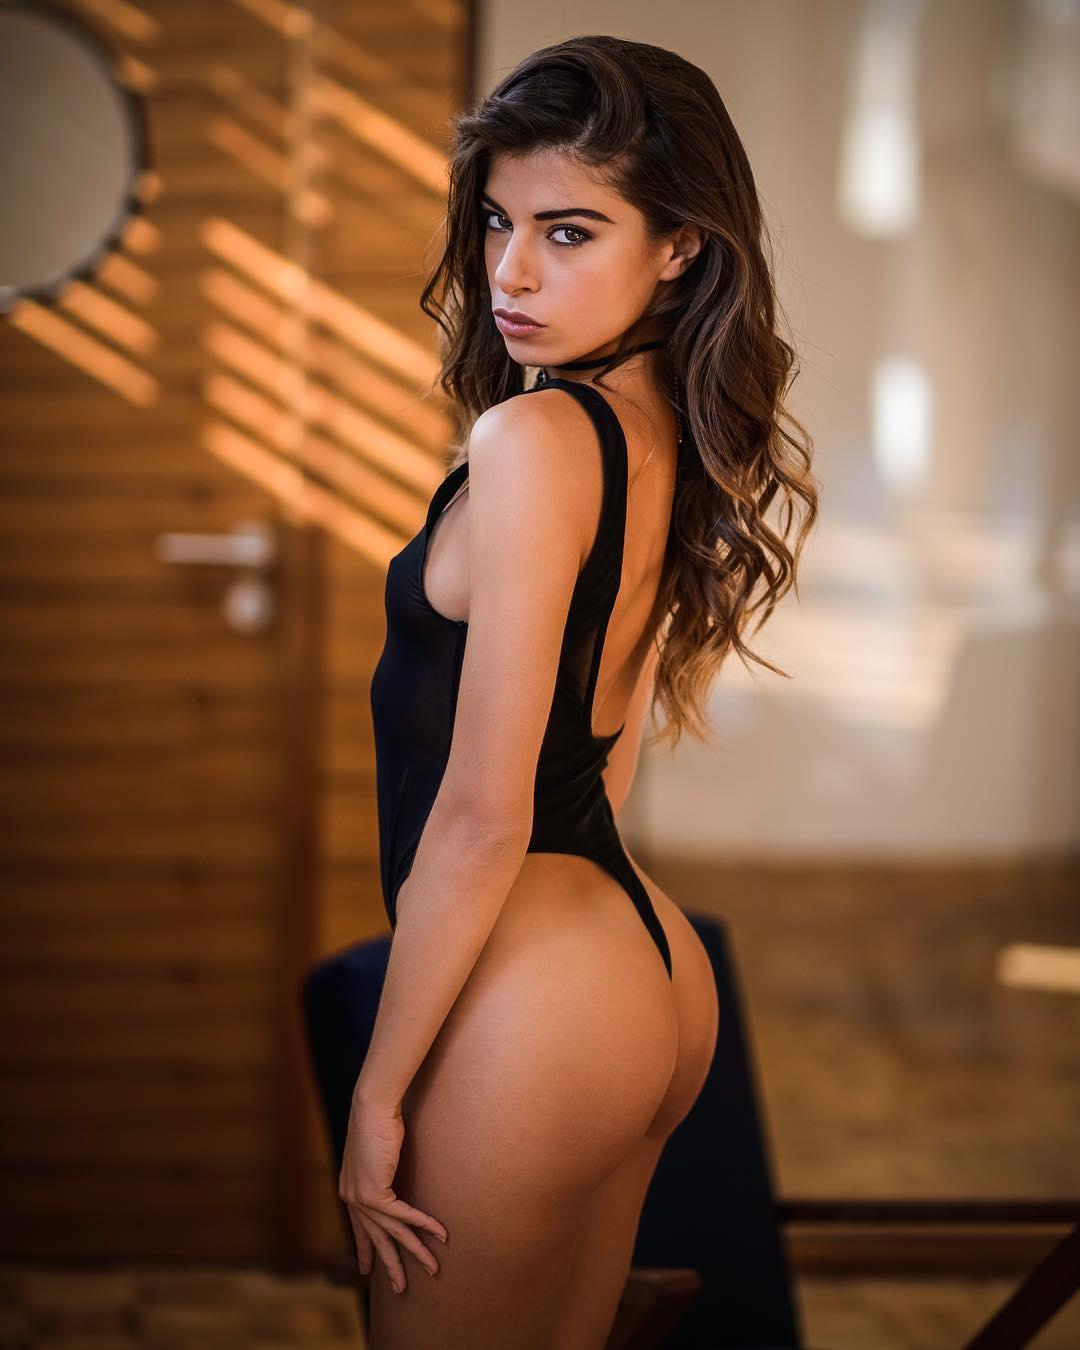 Chiara Bianchino nude (57 fotos) Bikini, Instagram, braless